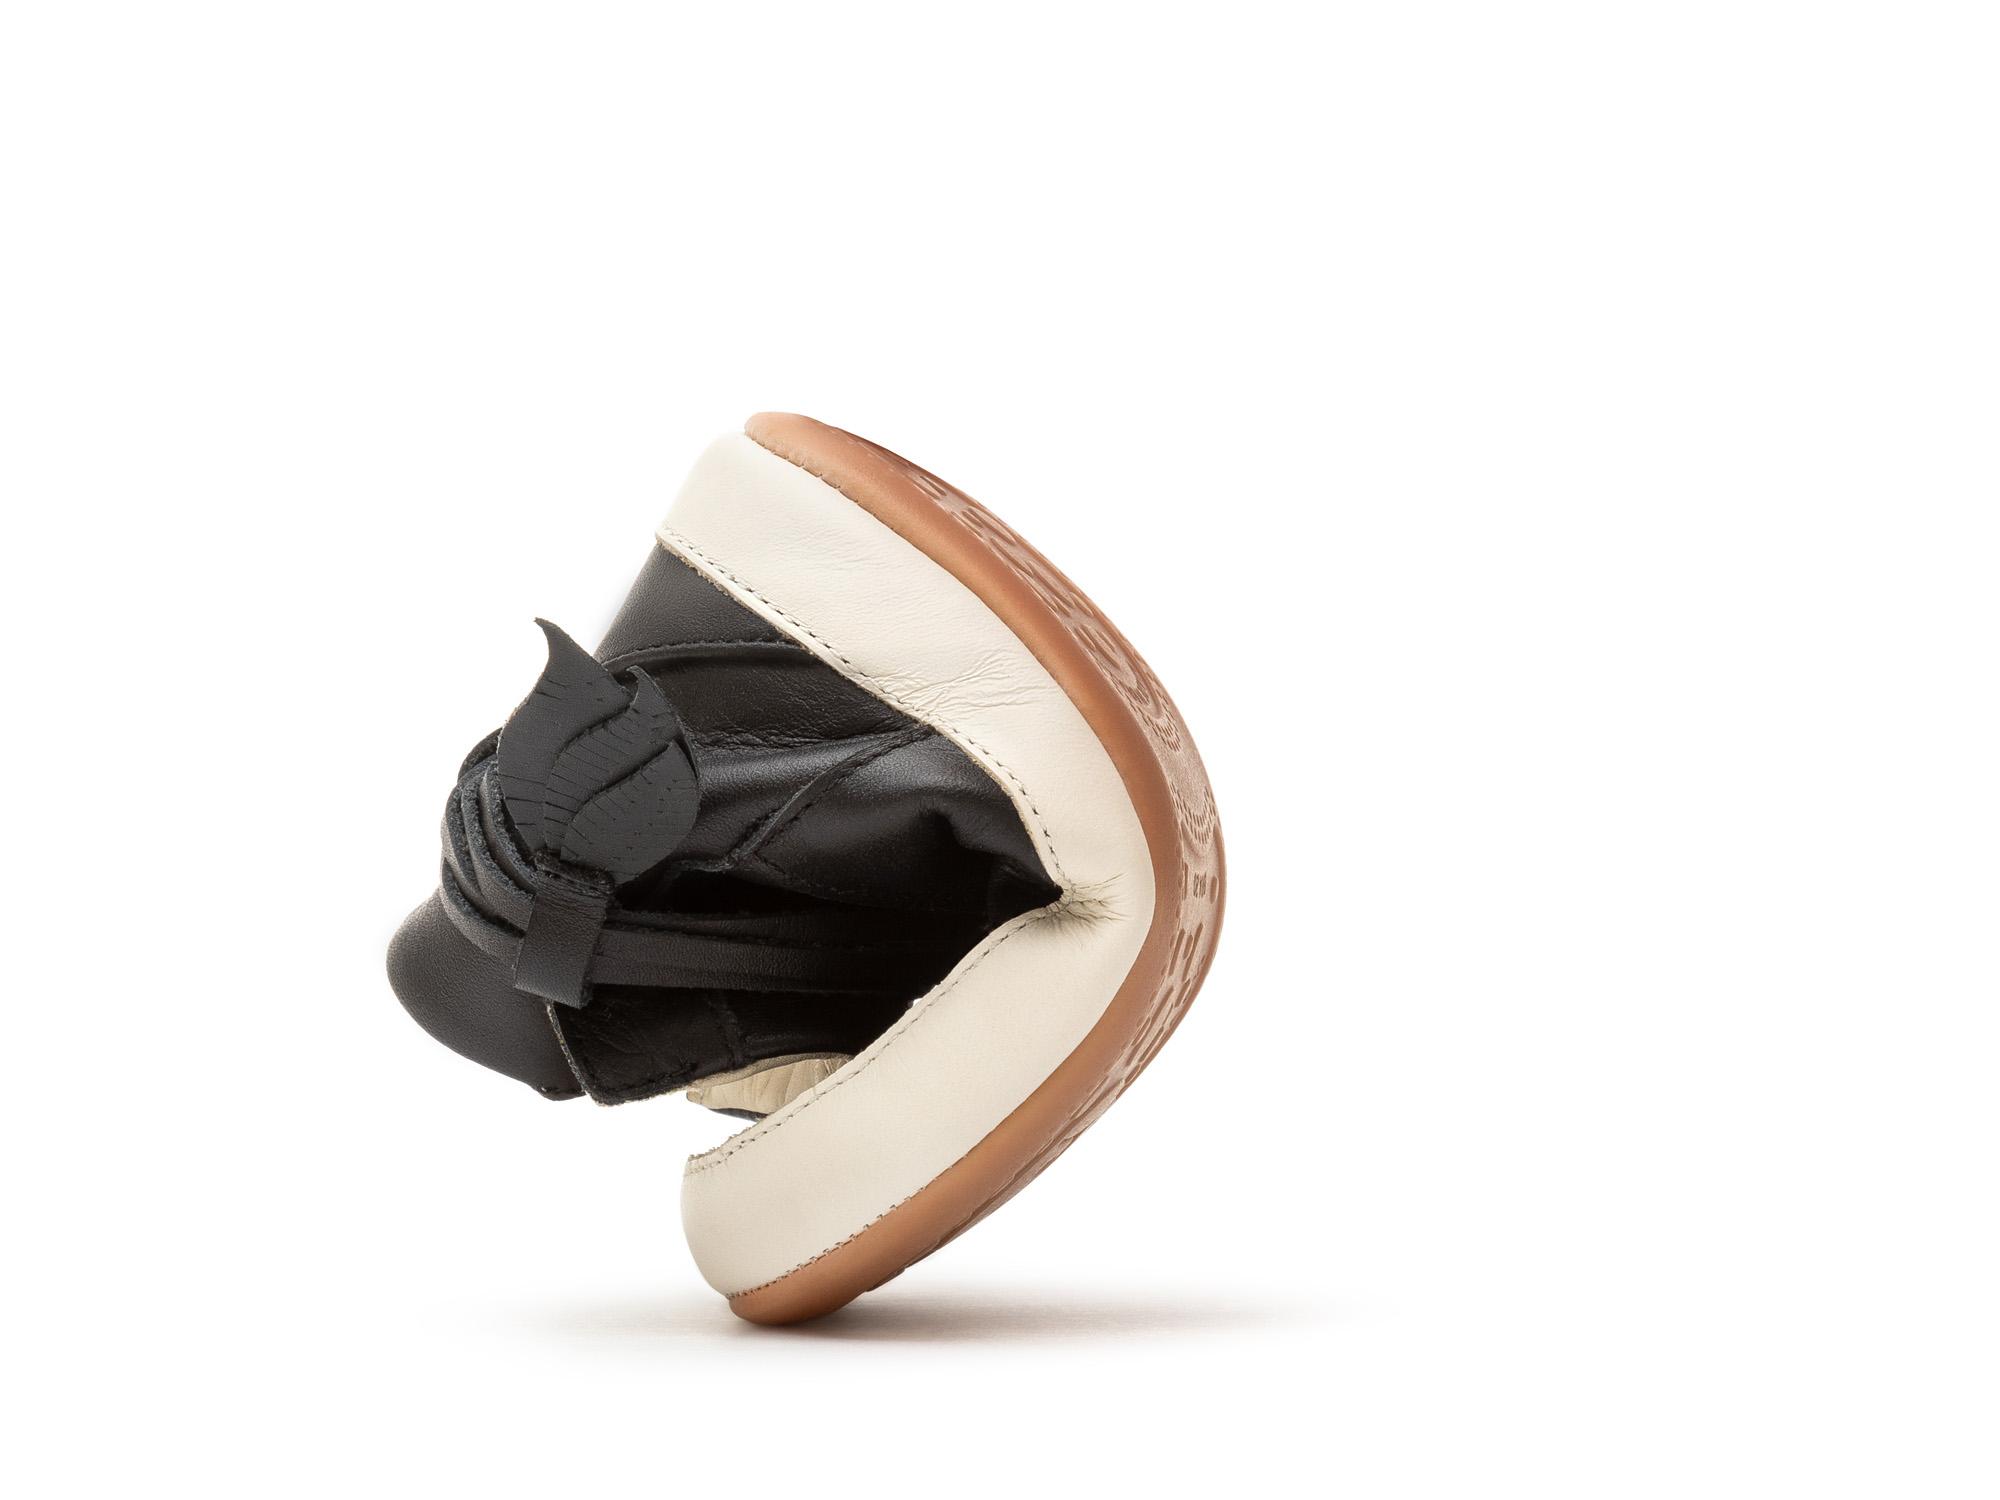 bota Bebê feminino ridgey leaf